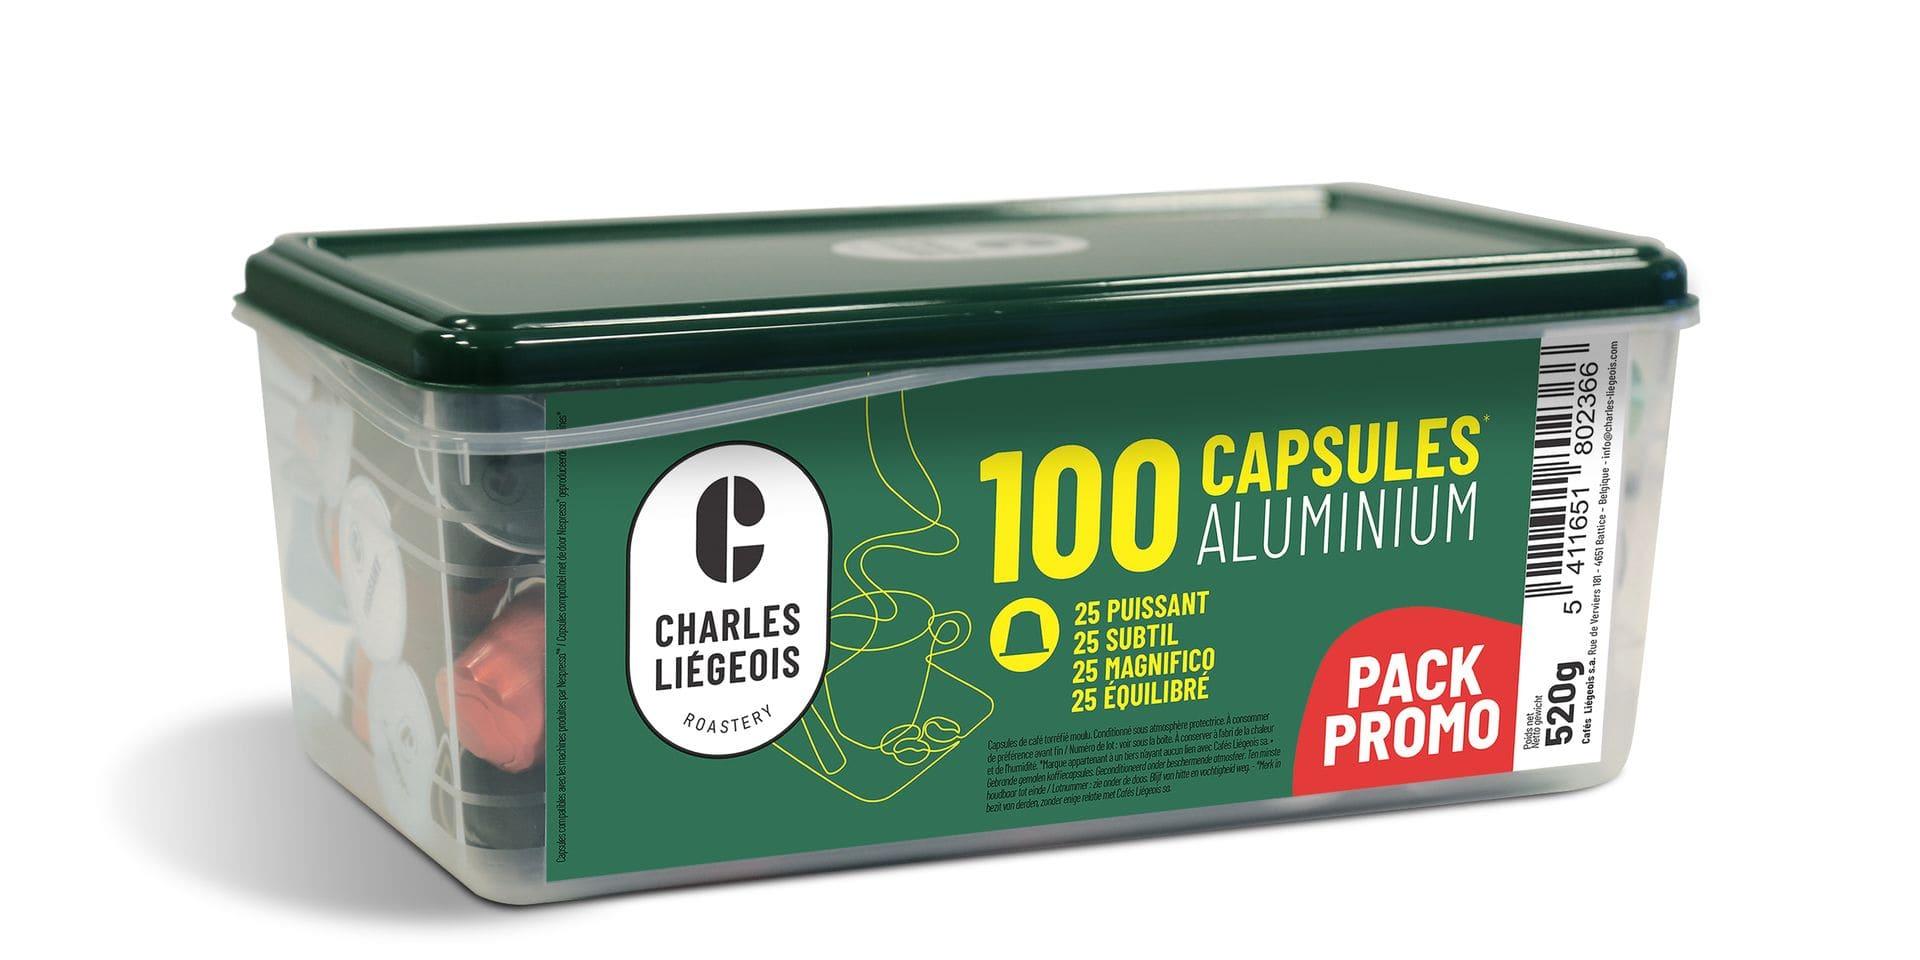 Gagnez 100 capsules nespresso Charles Liégeois ! 5000 capsules à gagner !